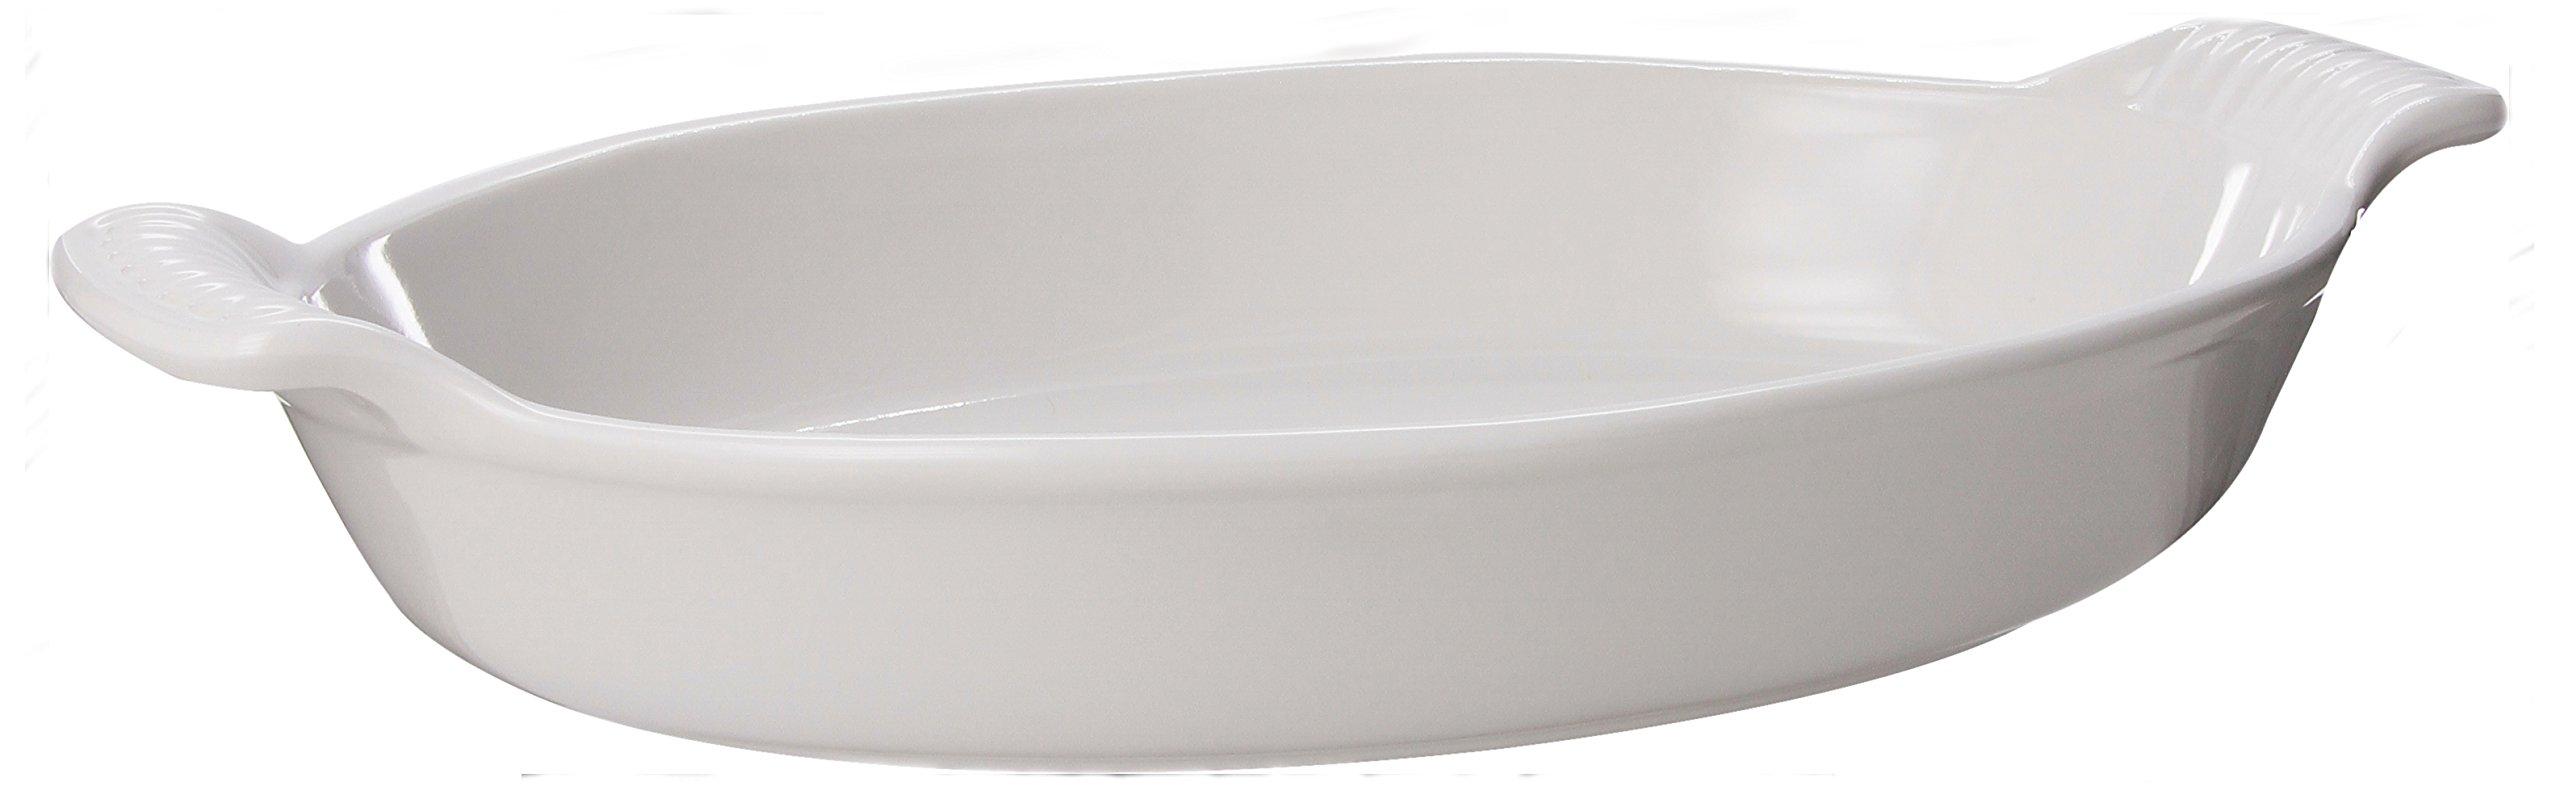 Le Creuset Heritage Stoneware 1.7 Quart Oval Au Gratin Dish, White